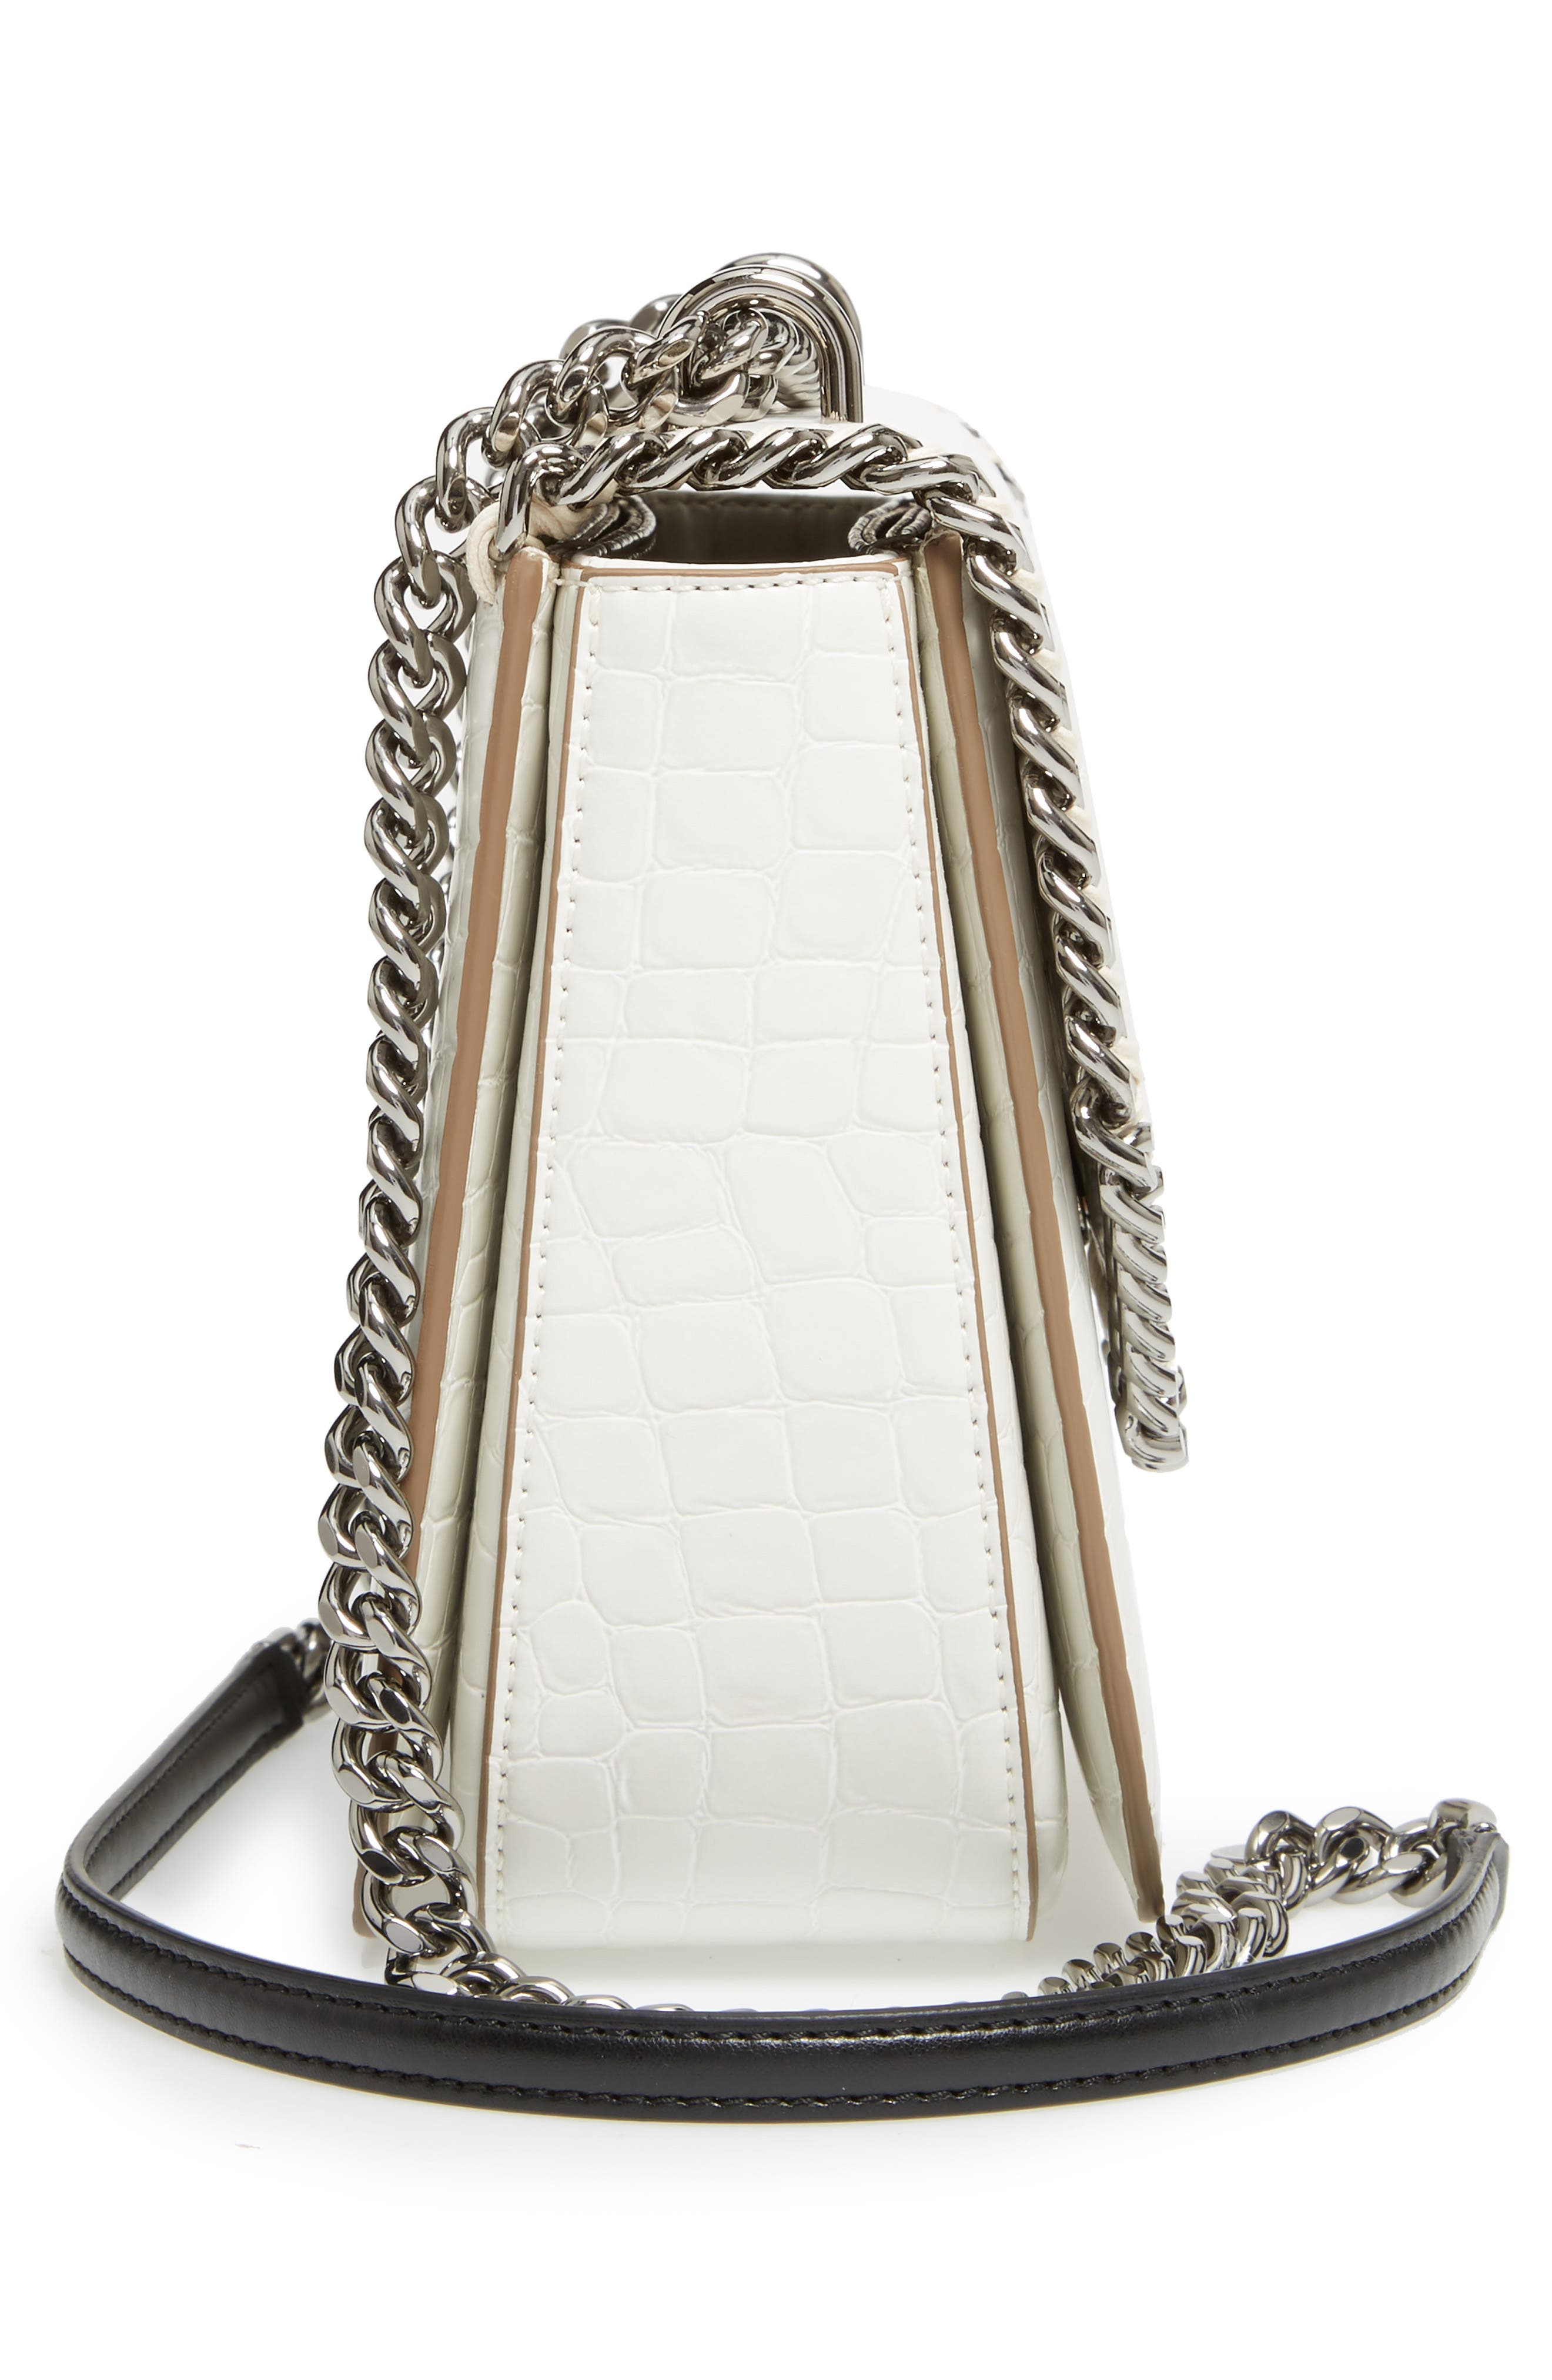 Medium Falabella Box Croc-Embossed Faux Leather Shoulder Bag,                             Alternate thumbnail 5, color,                             102